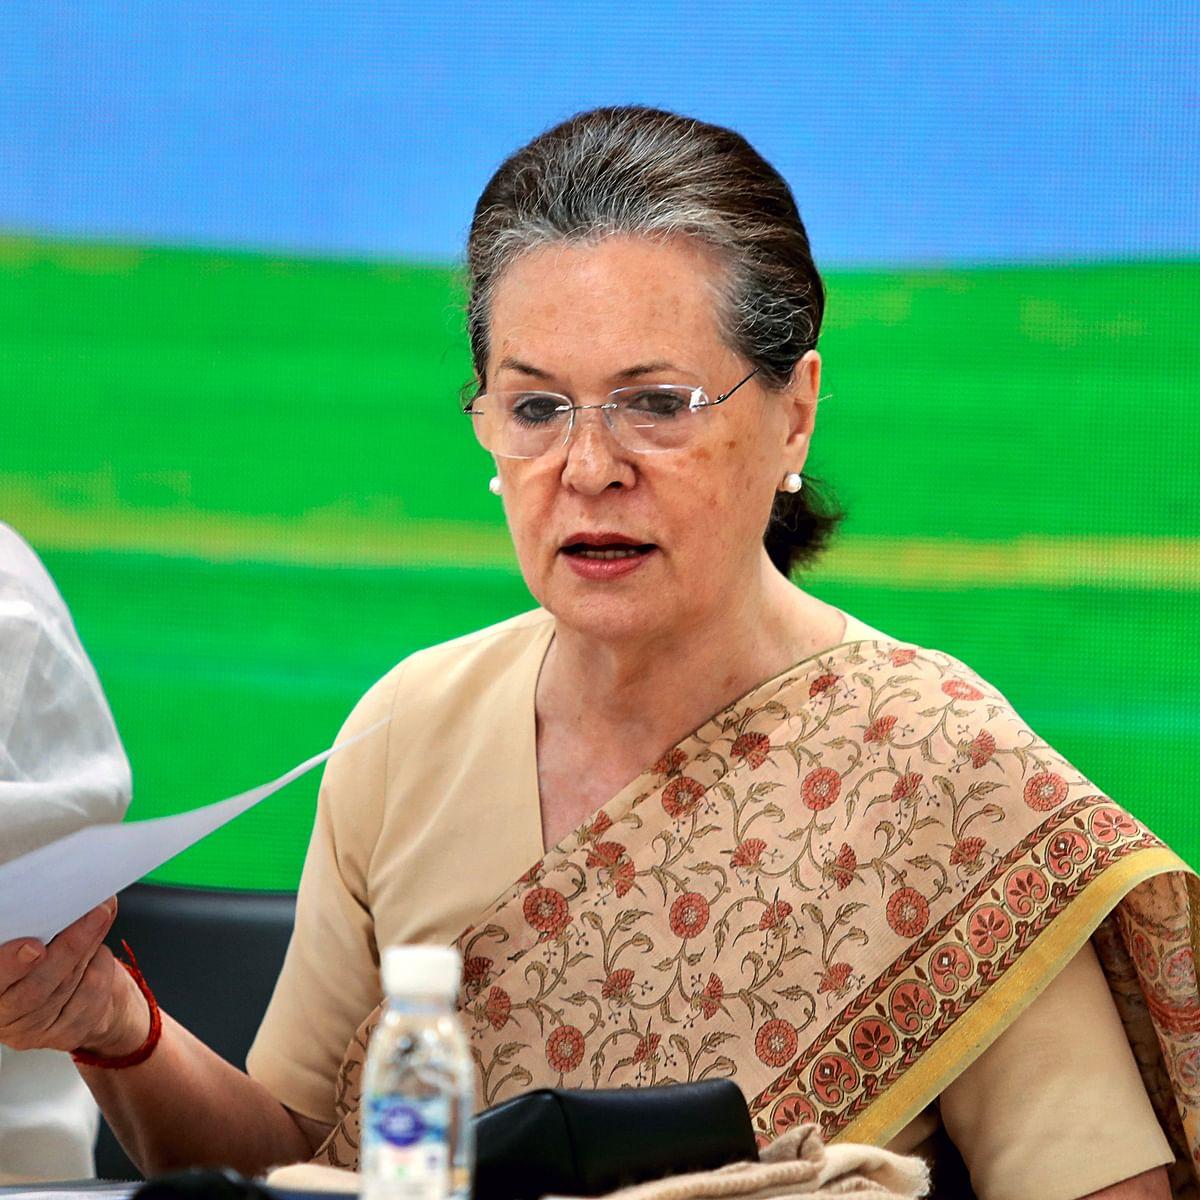 PM forgets DeMo, nation won't: Sonia Gandhi